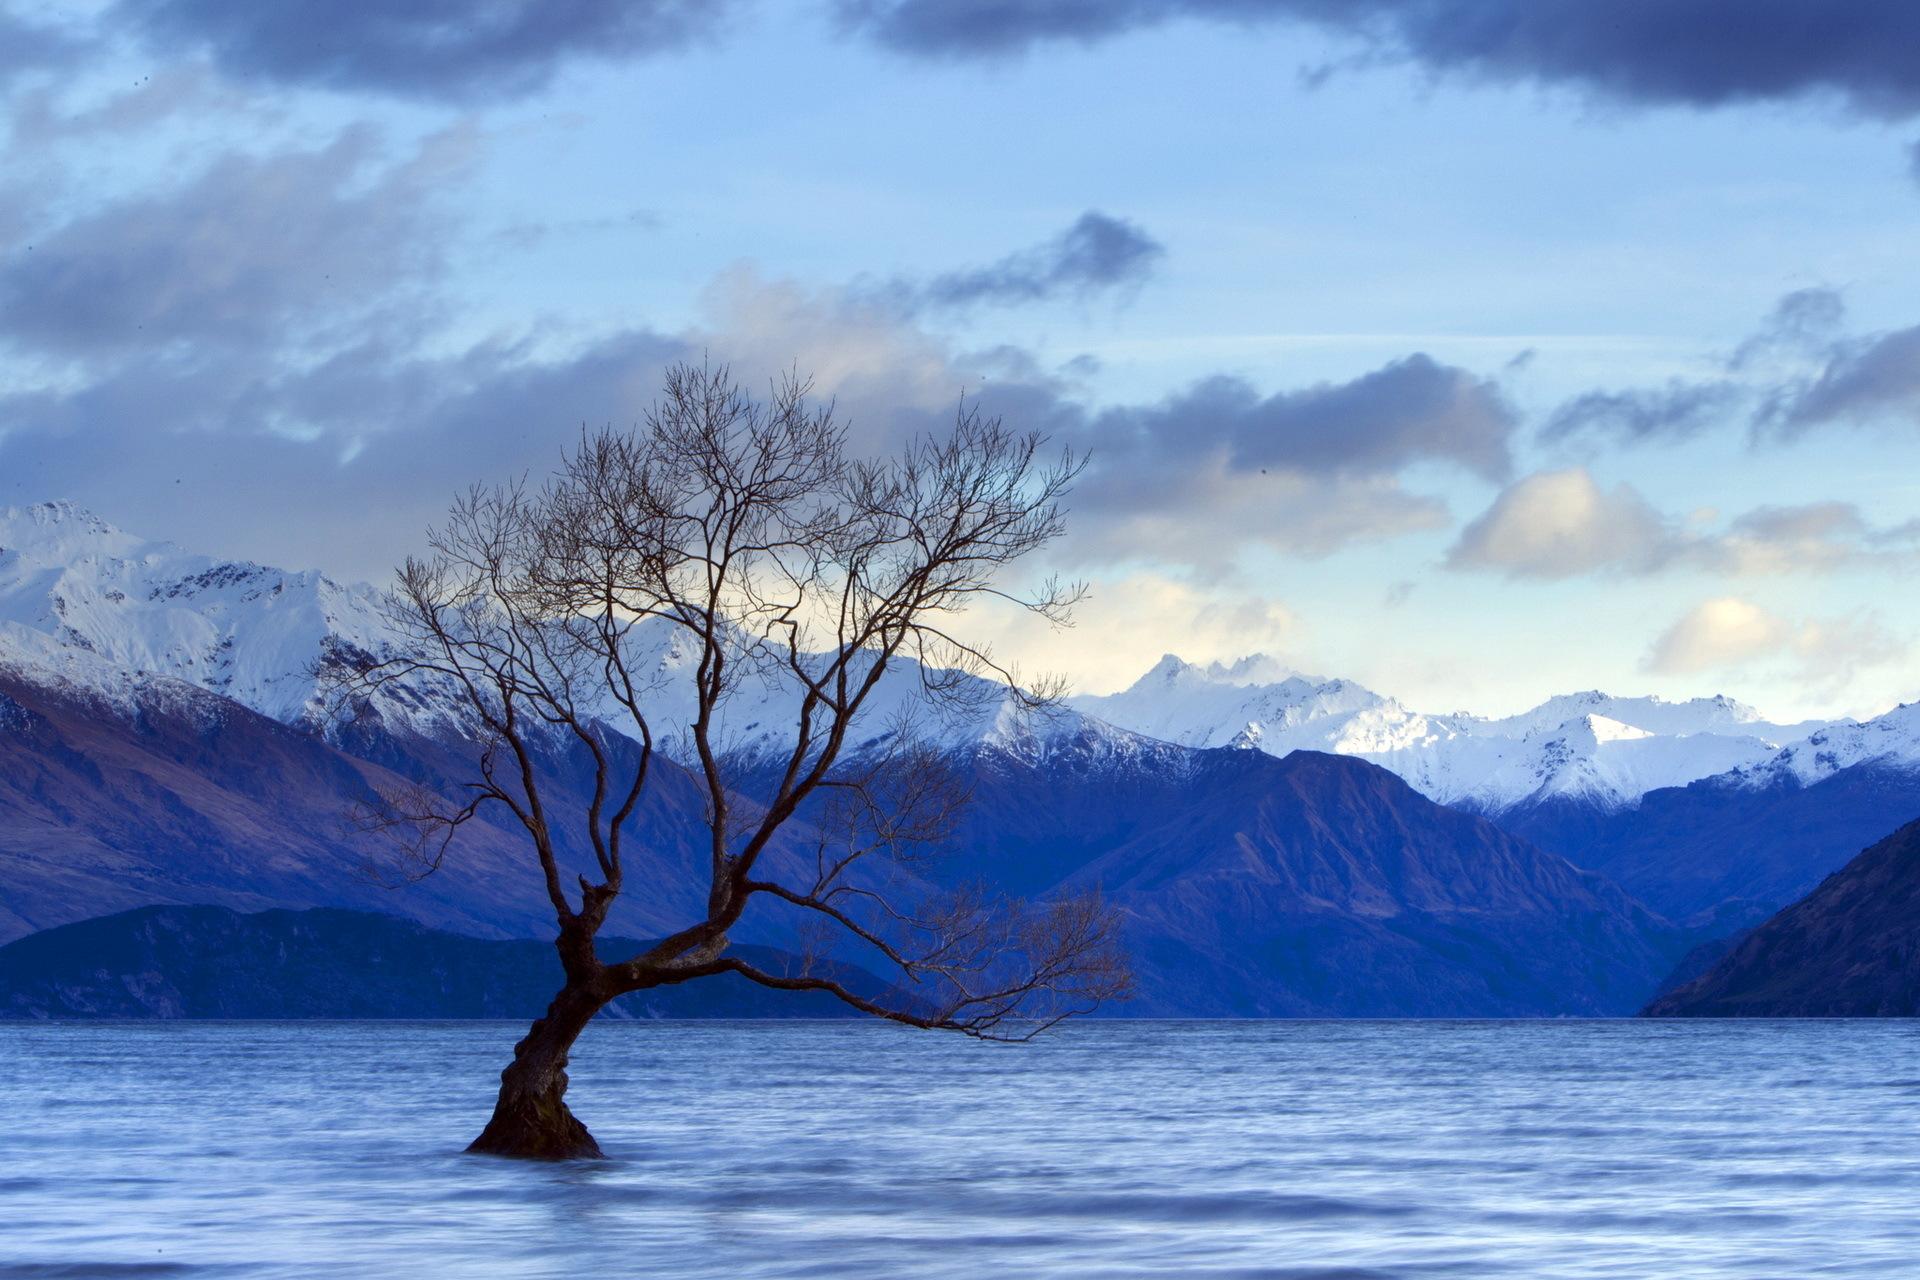 природа горы облака деревья река nature mountains clouds trees river  № 1000546 бесплатно